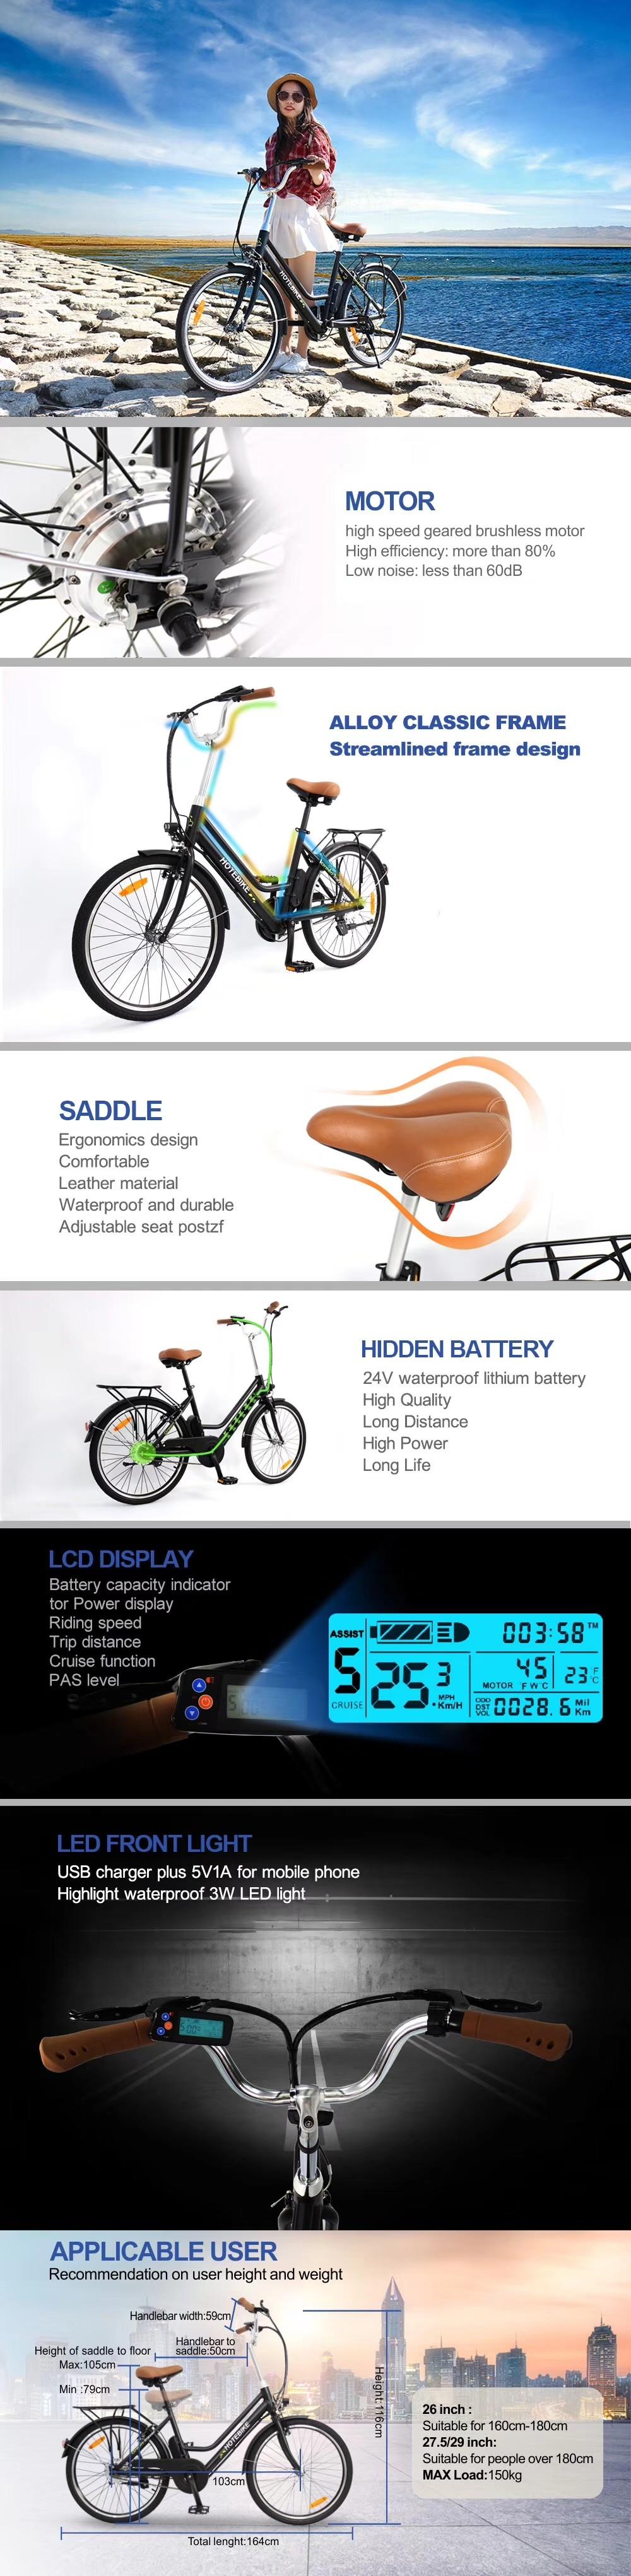 small electric bike